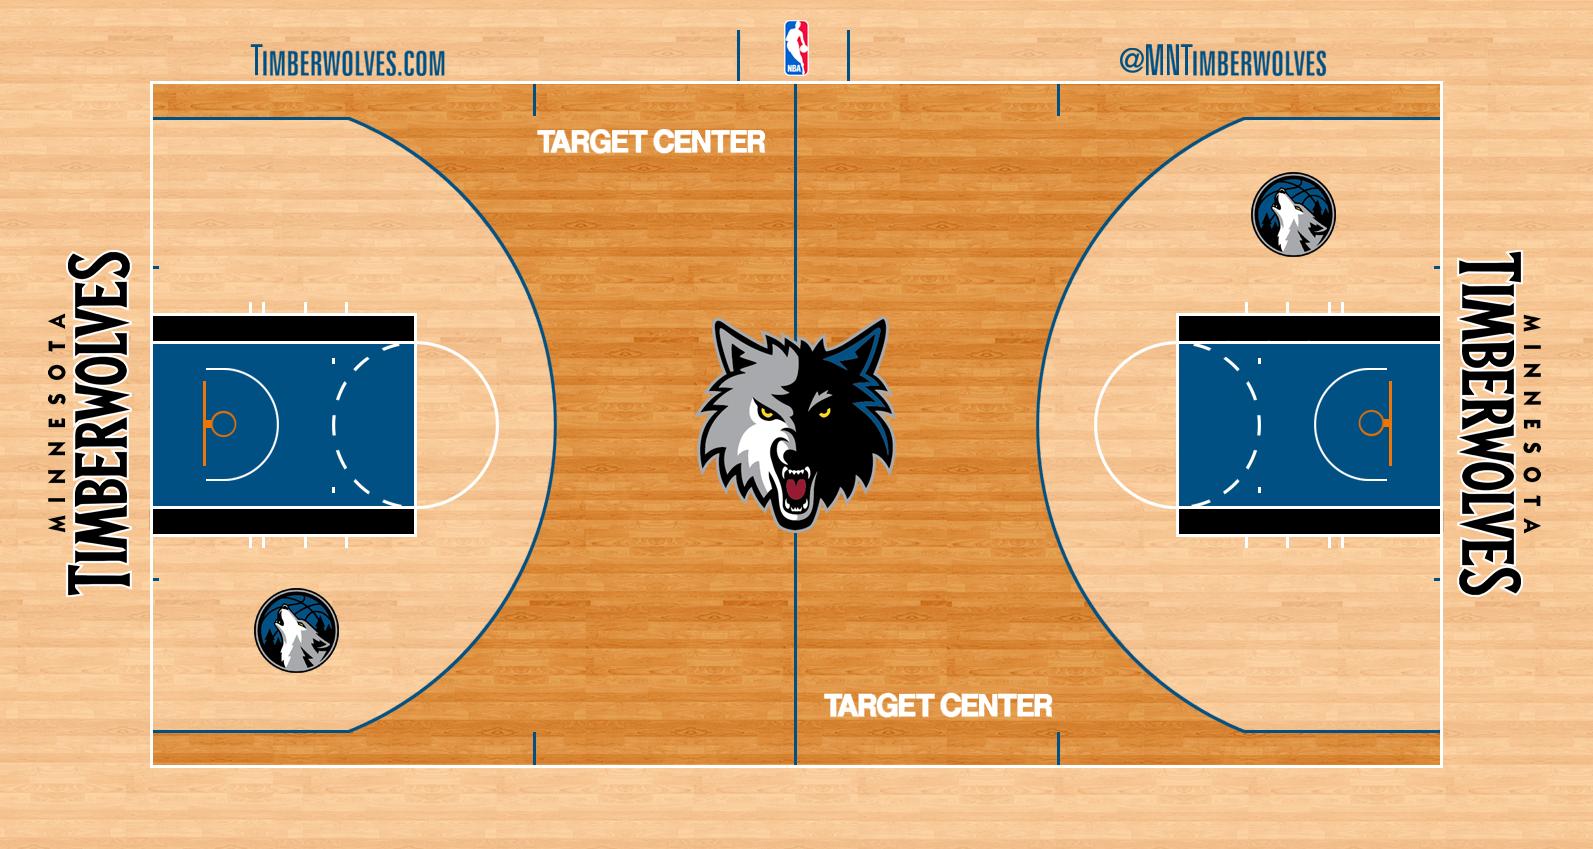 Minnesota Timberwolves Logo Stadium Logo (2012/13-2016/17) - Minnesota Timberwolves home court - Target Center SportsLogos.Net